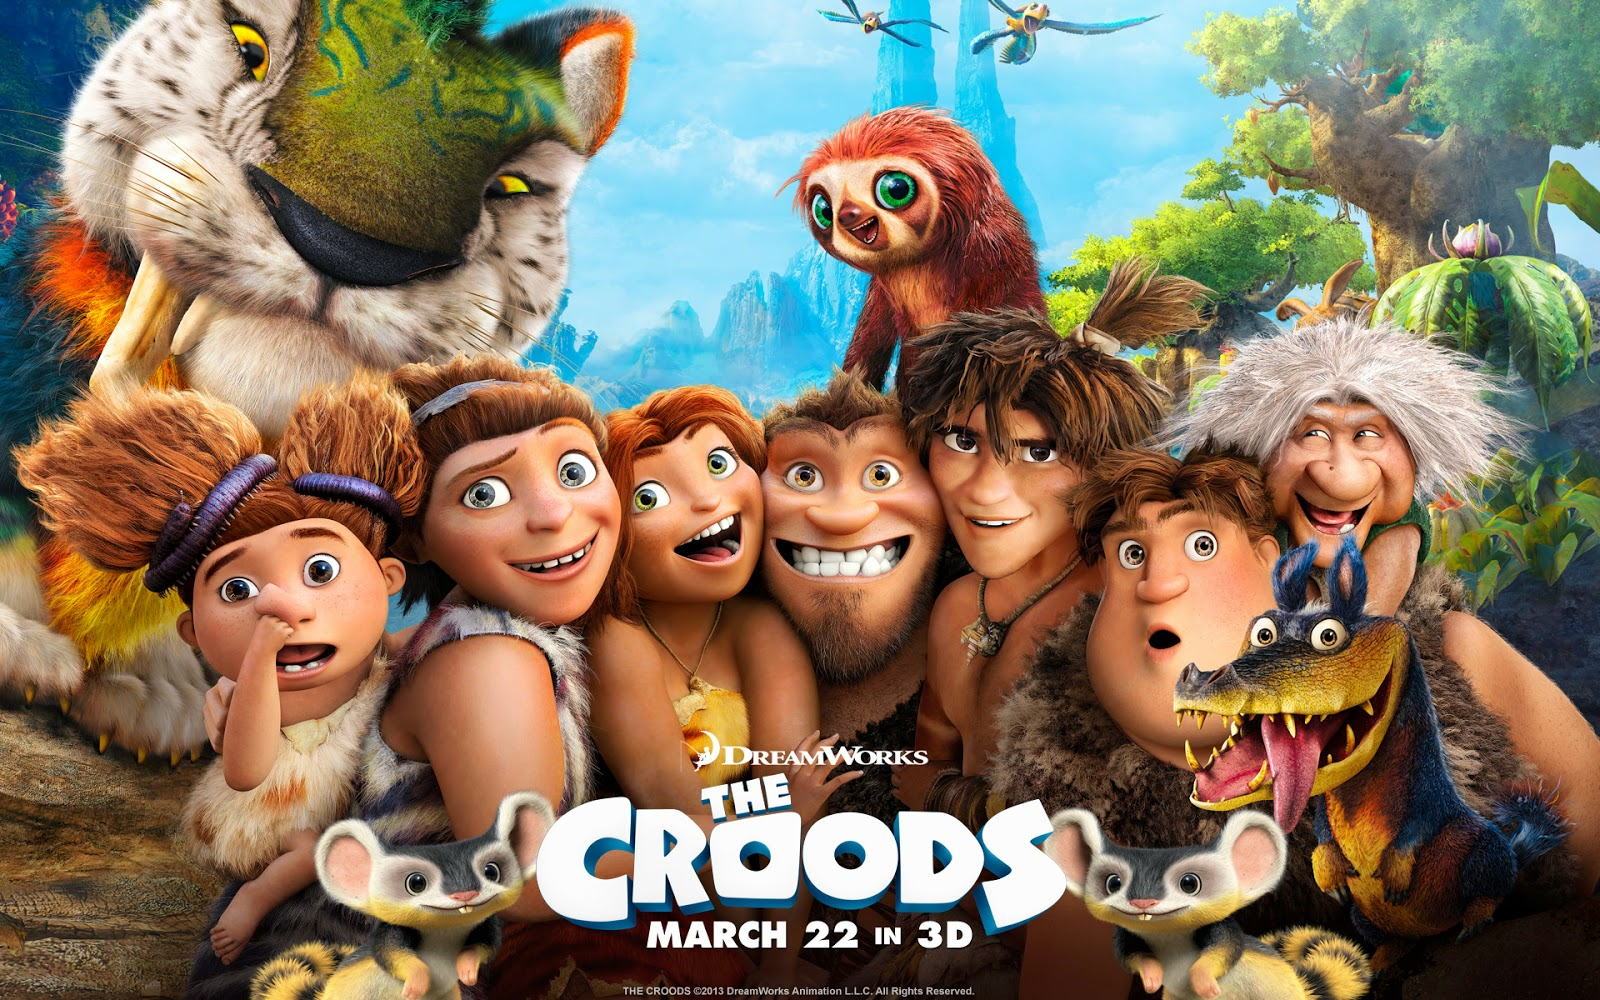 the croods [2013 kartun usa brrip 1080p nitro 1410 mb google drive